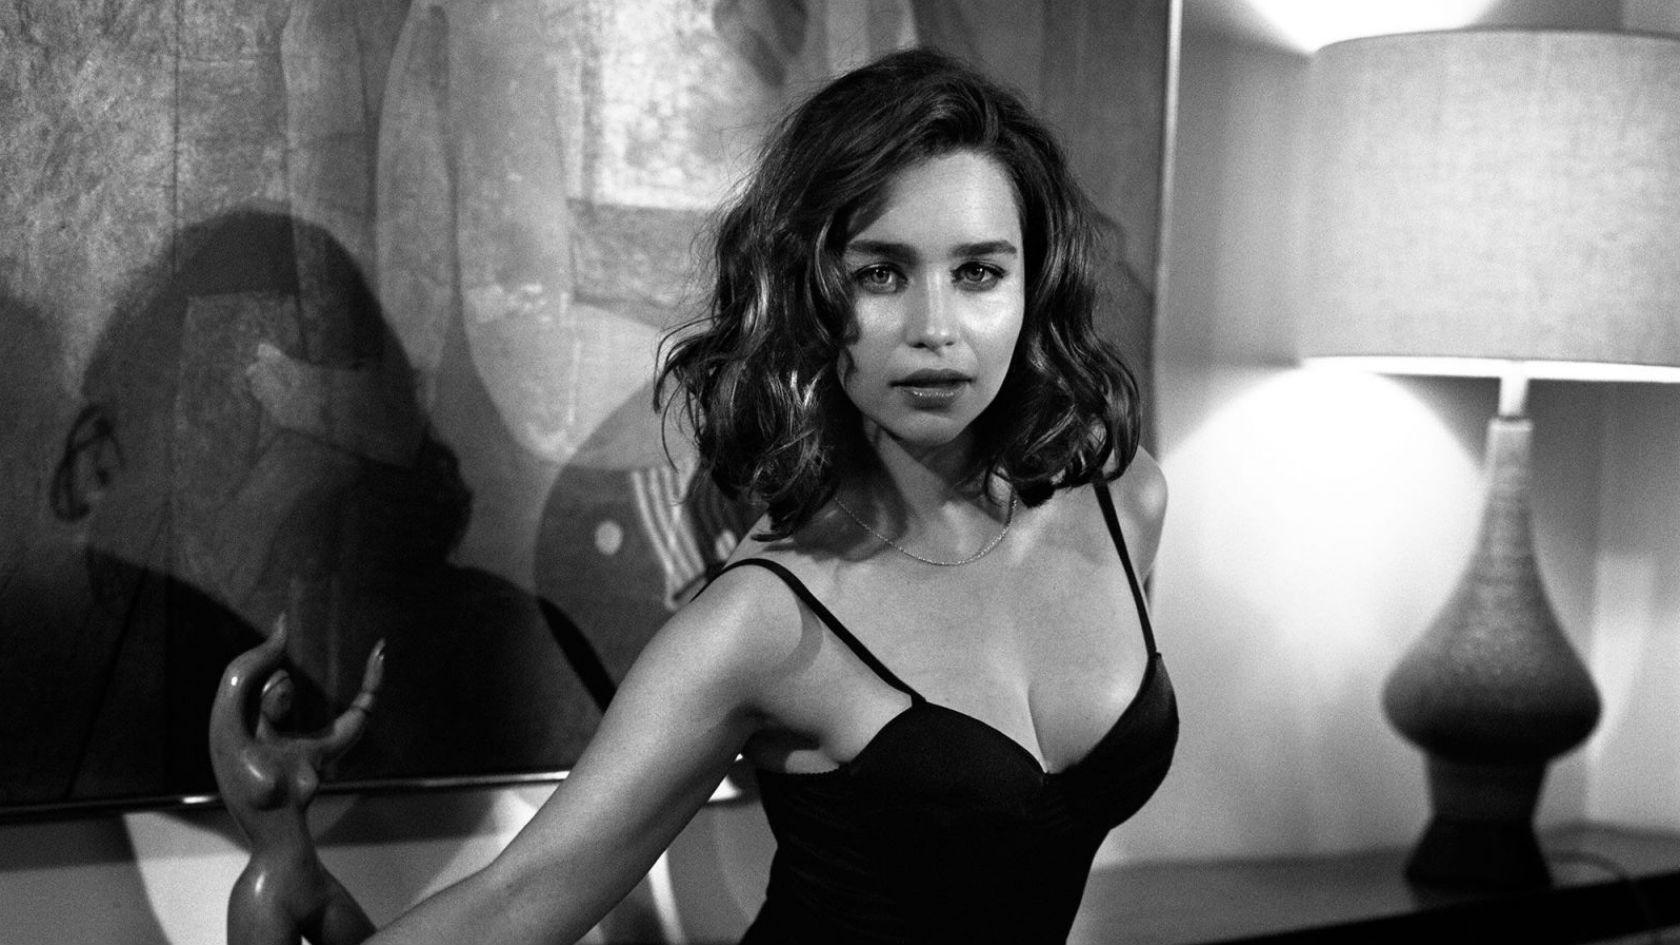 Sexiest woman alive wiki